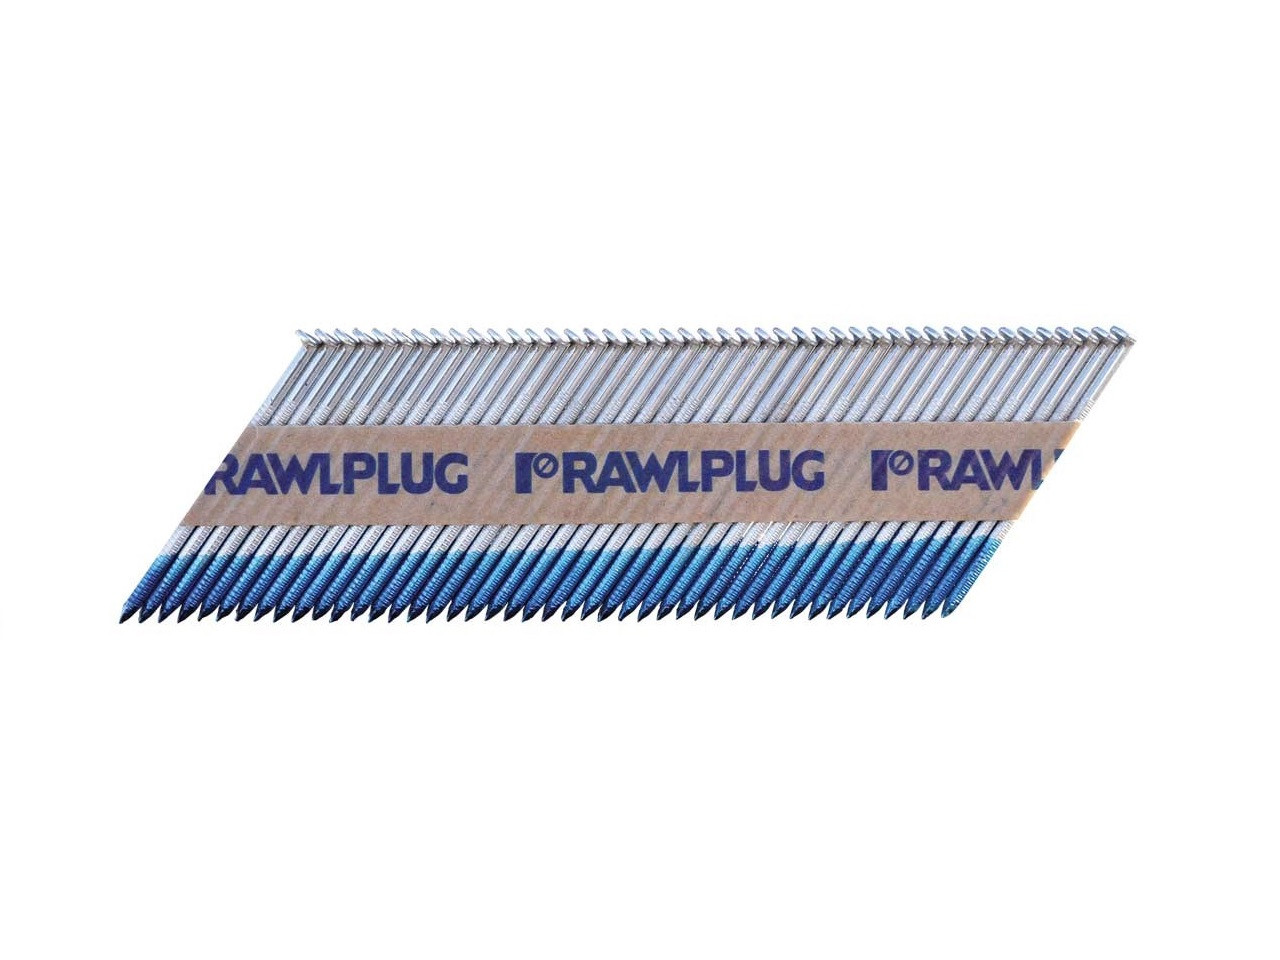 3.1x75mm Rawlplug Smooth Ring Bright Nails (Box 2200 & 2 Fuel Cells) CE